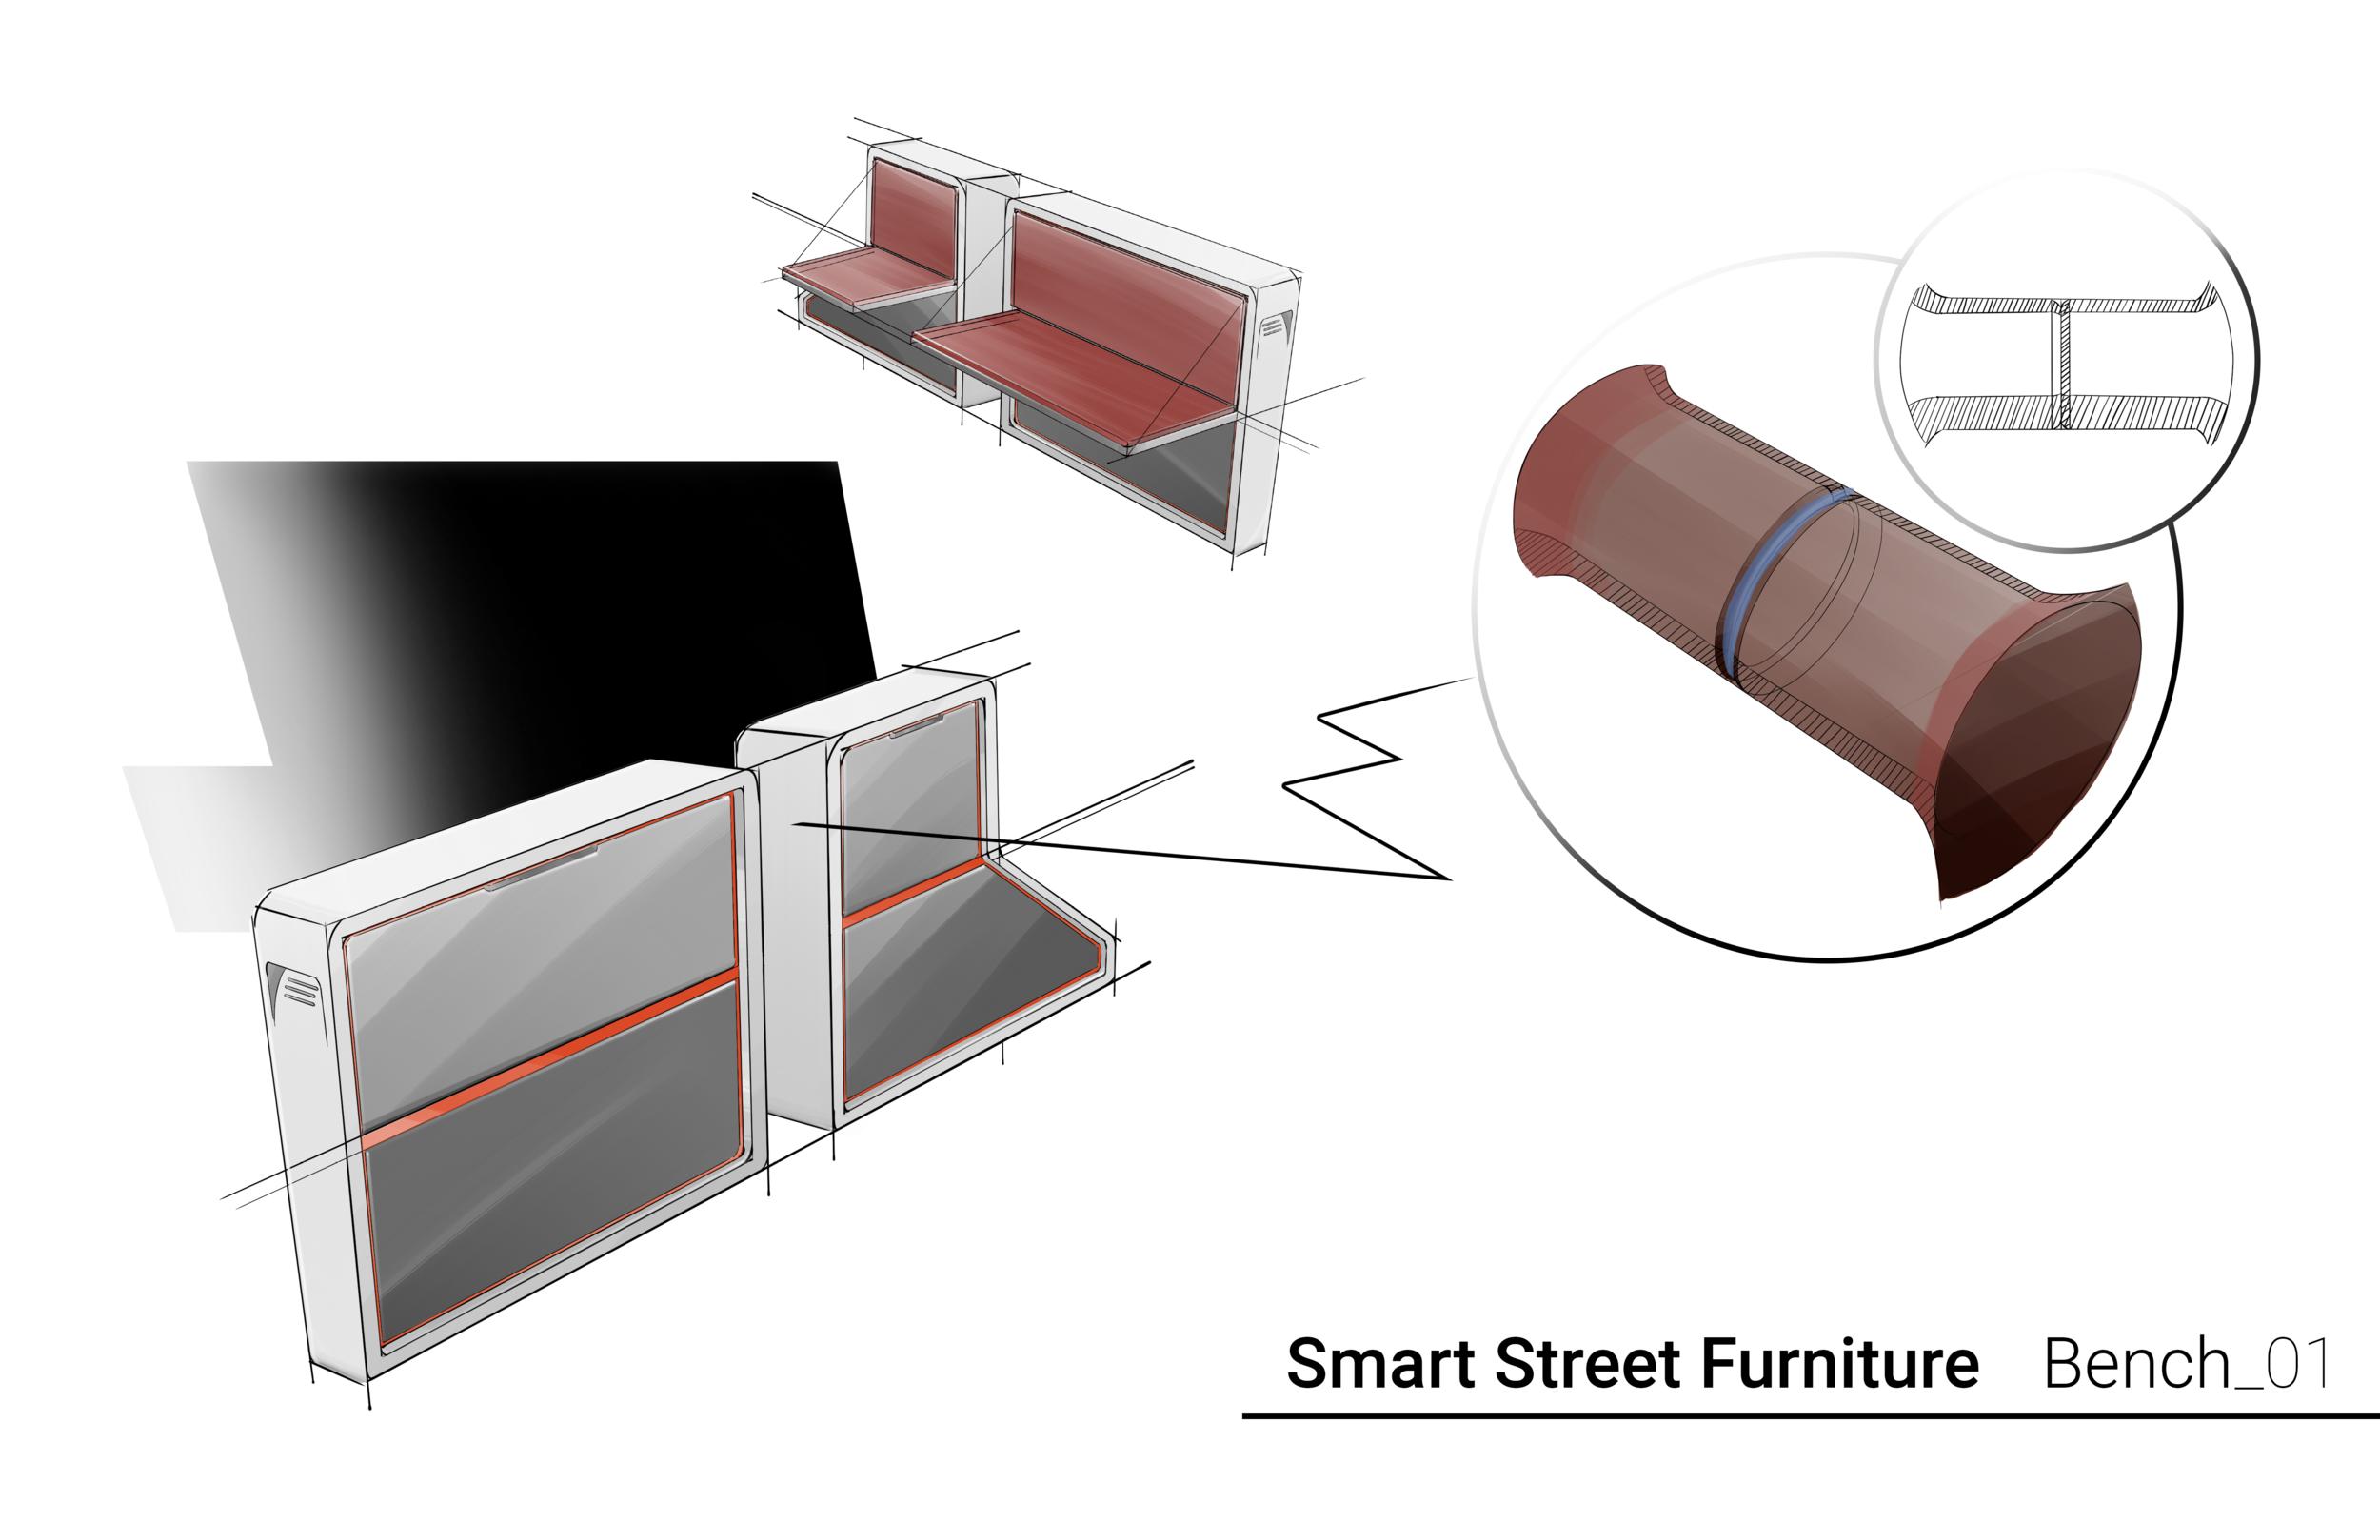 SSF Bench 01 Concept